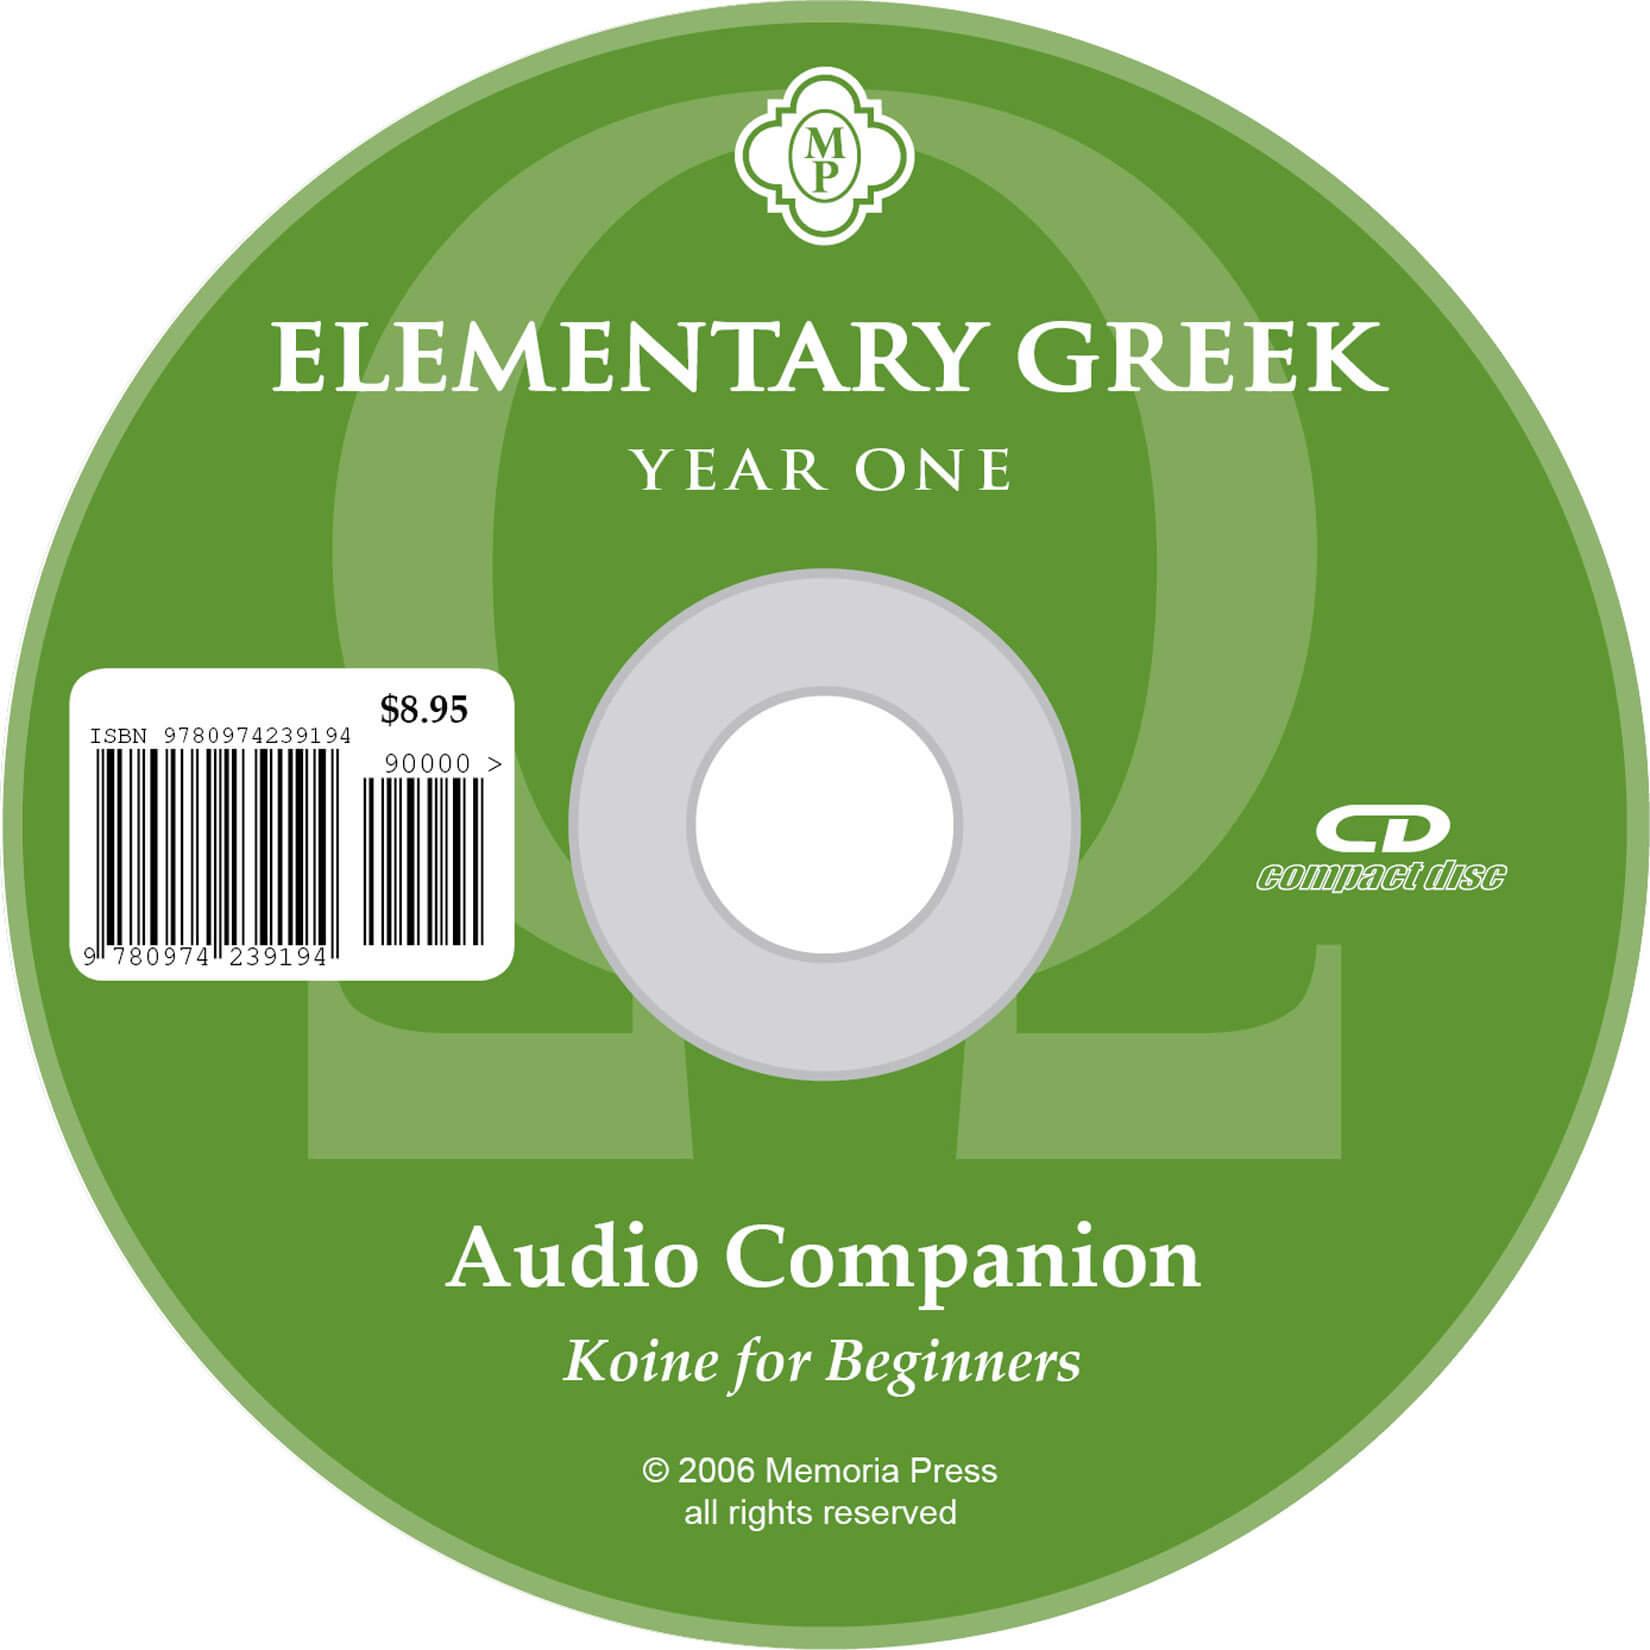 Elementary Greek Year 1 CD